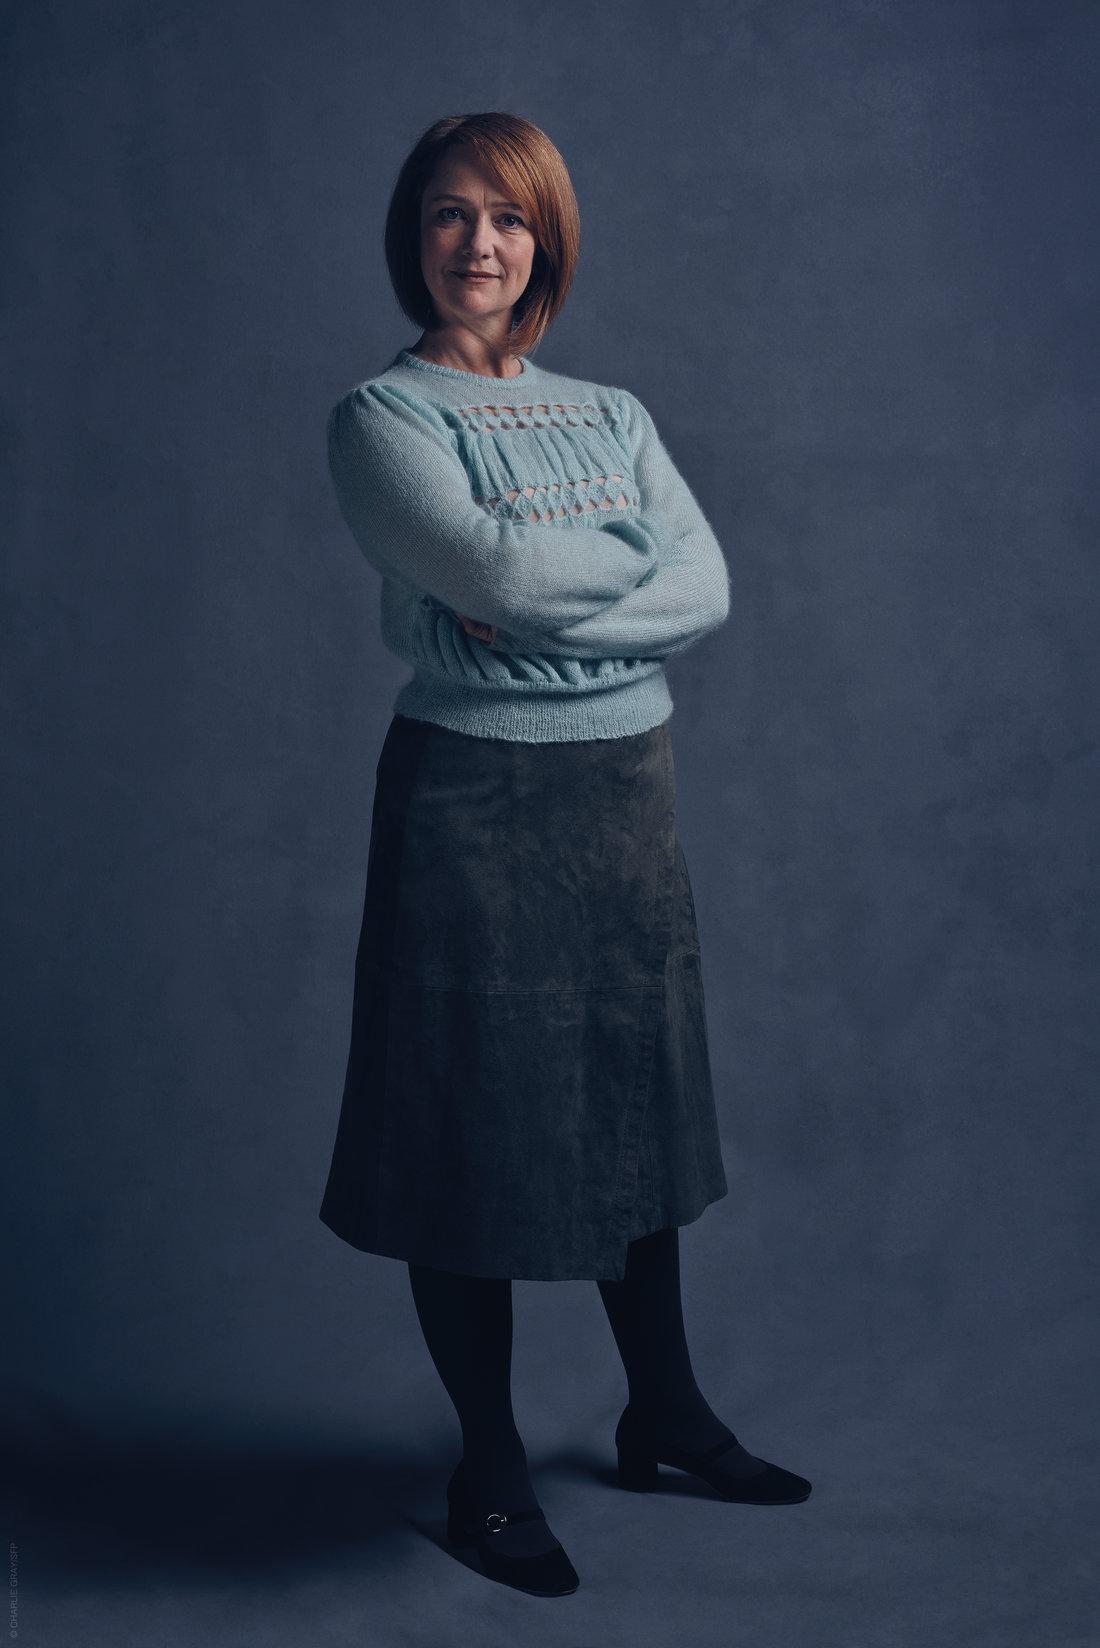 Harry Potter and the Cursed Child: Poppy Miller interpreta Ginny